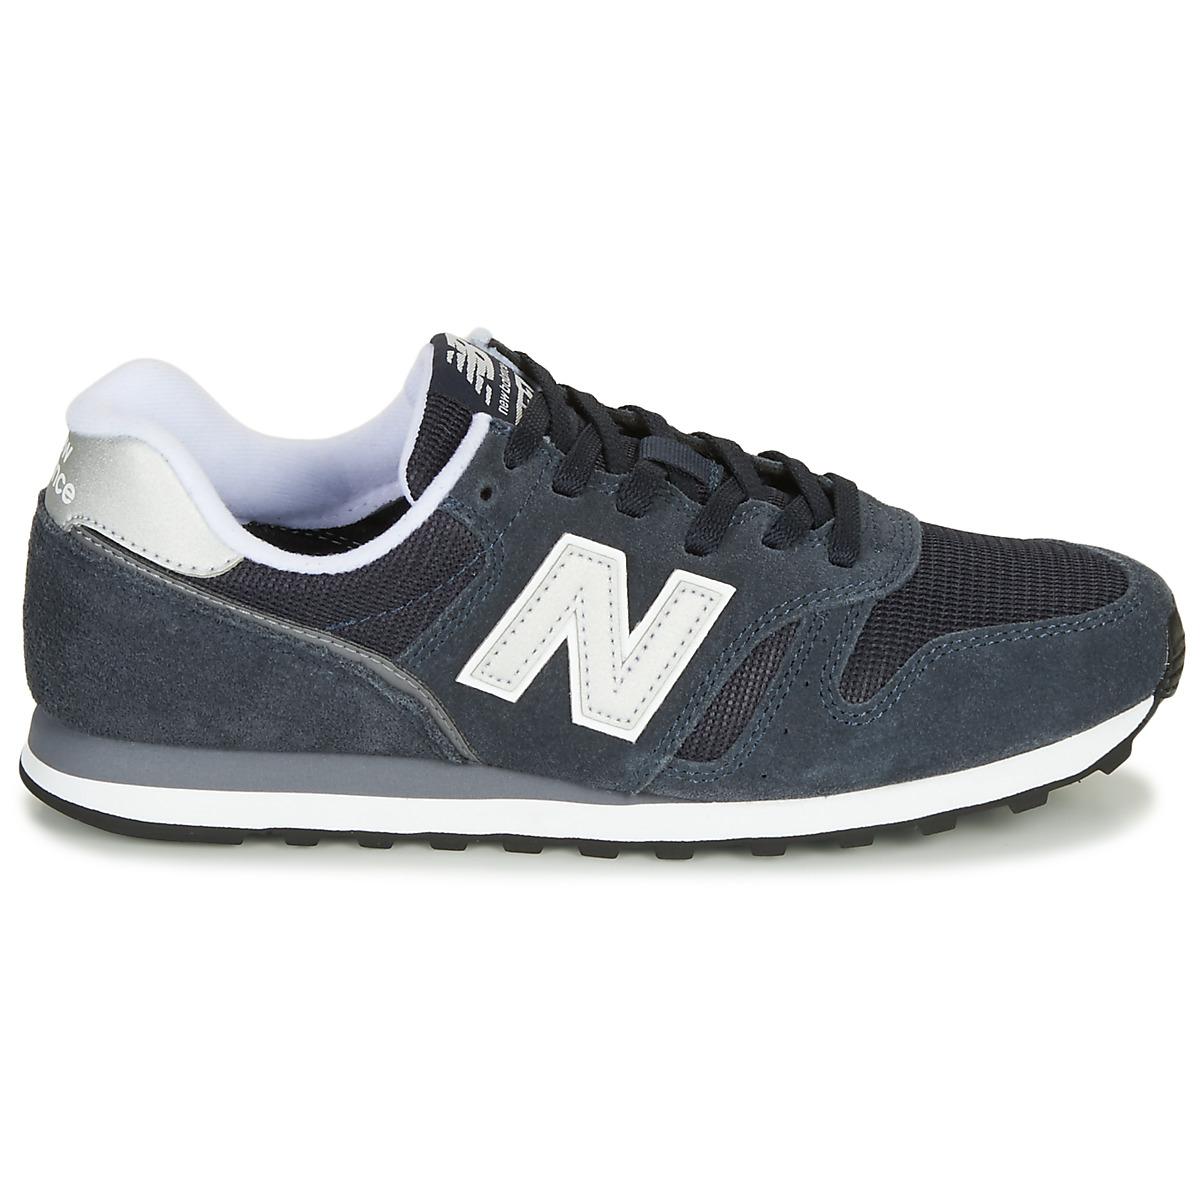 New Balance 373 Blu Uomo 16289201 Consegna Gratuita